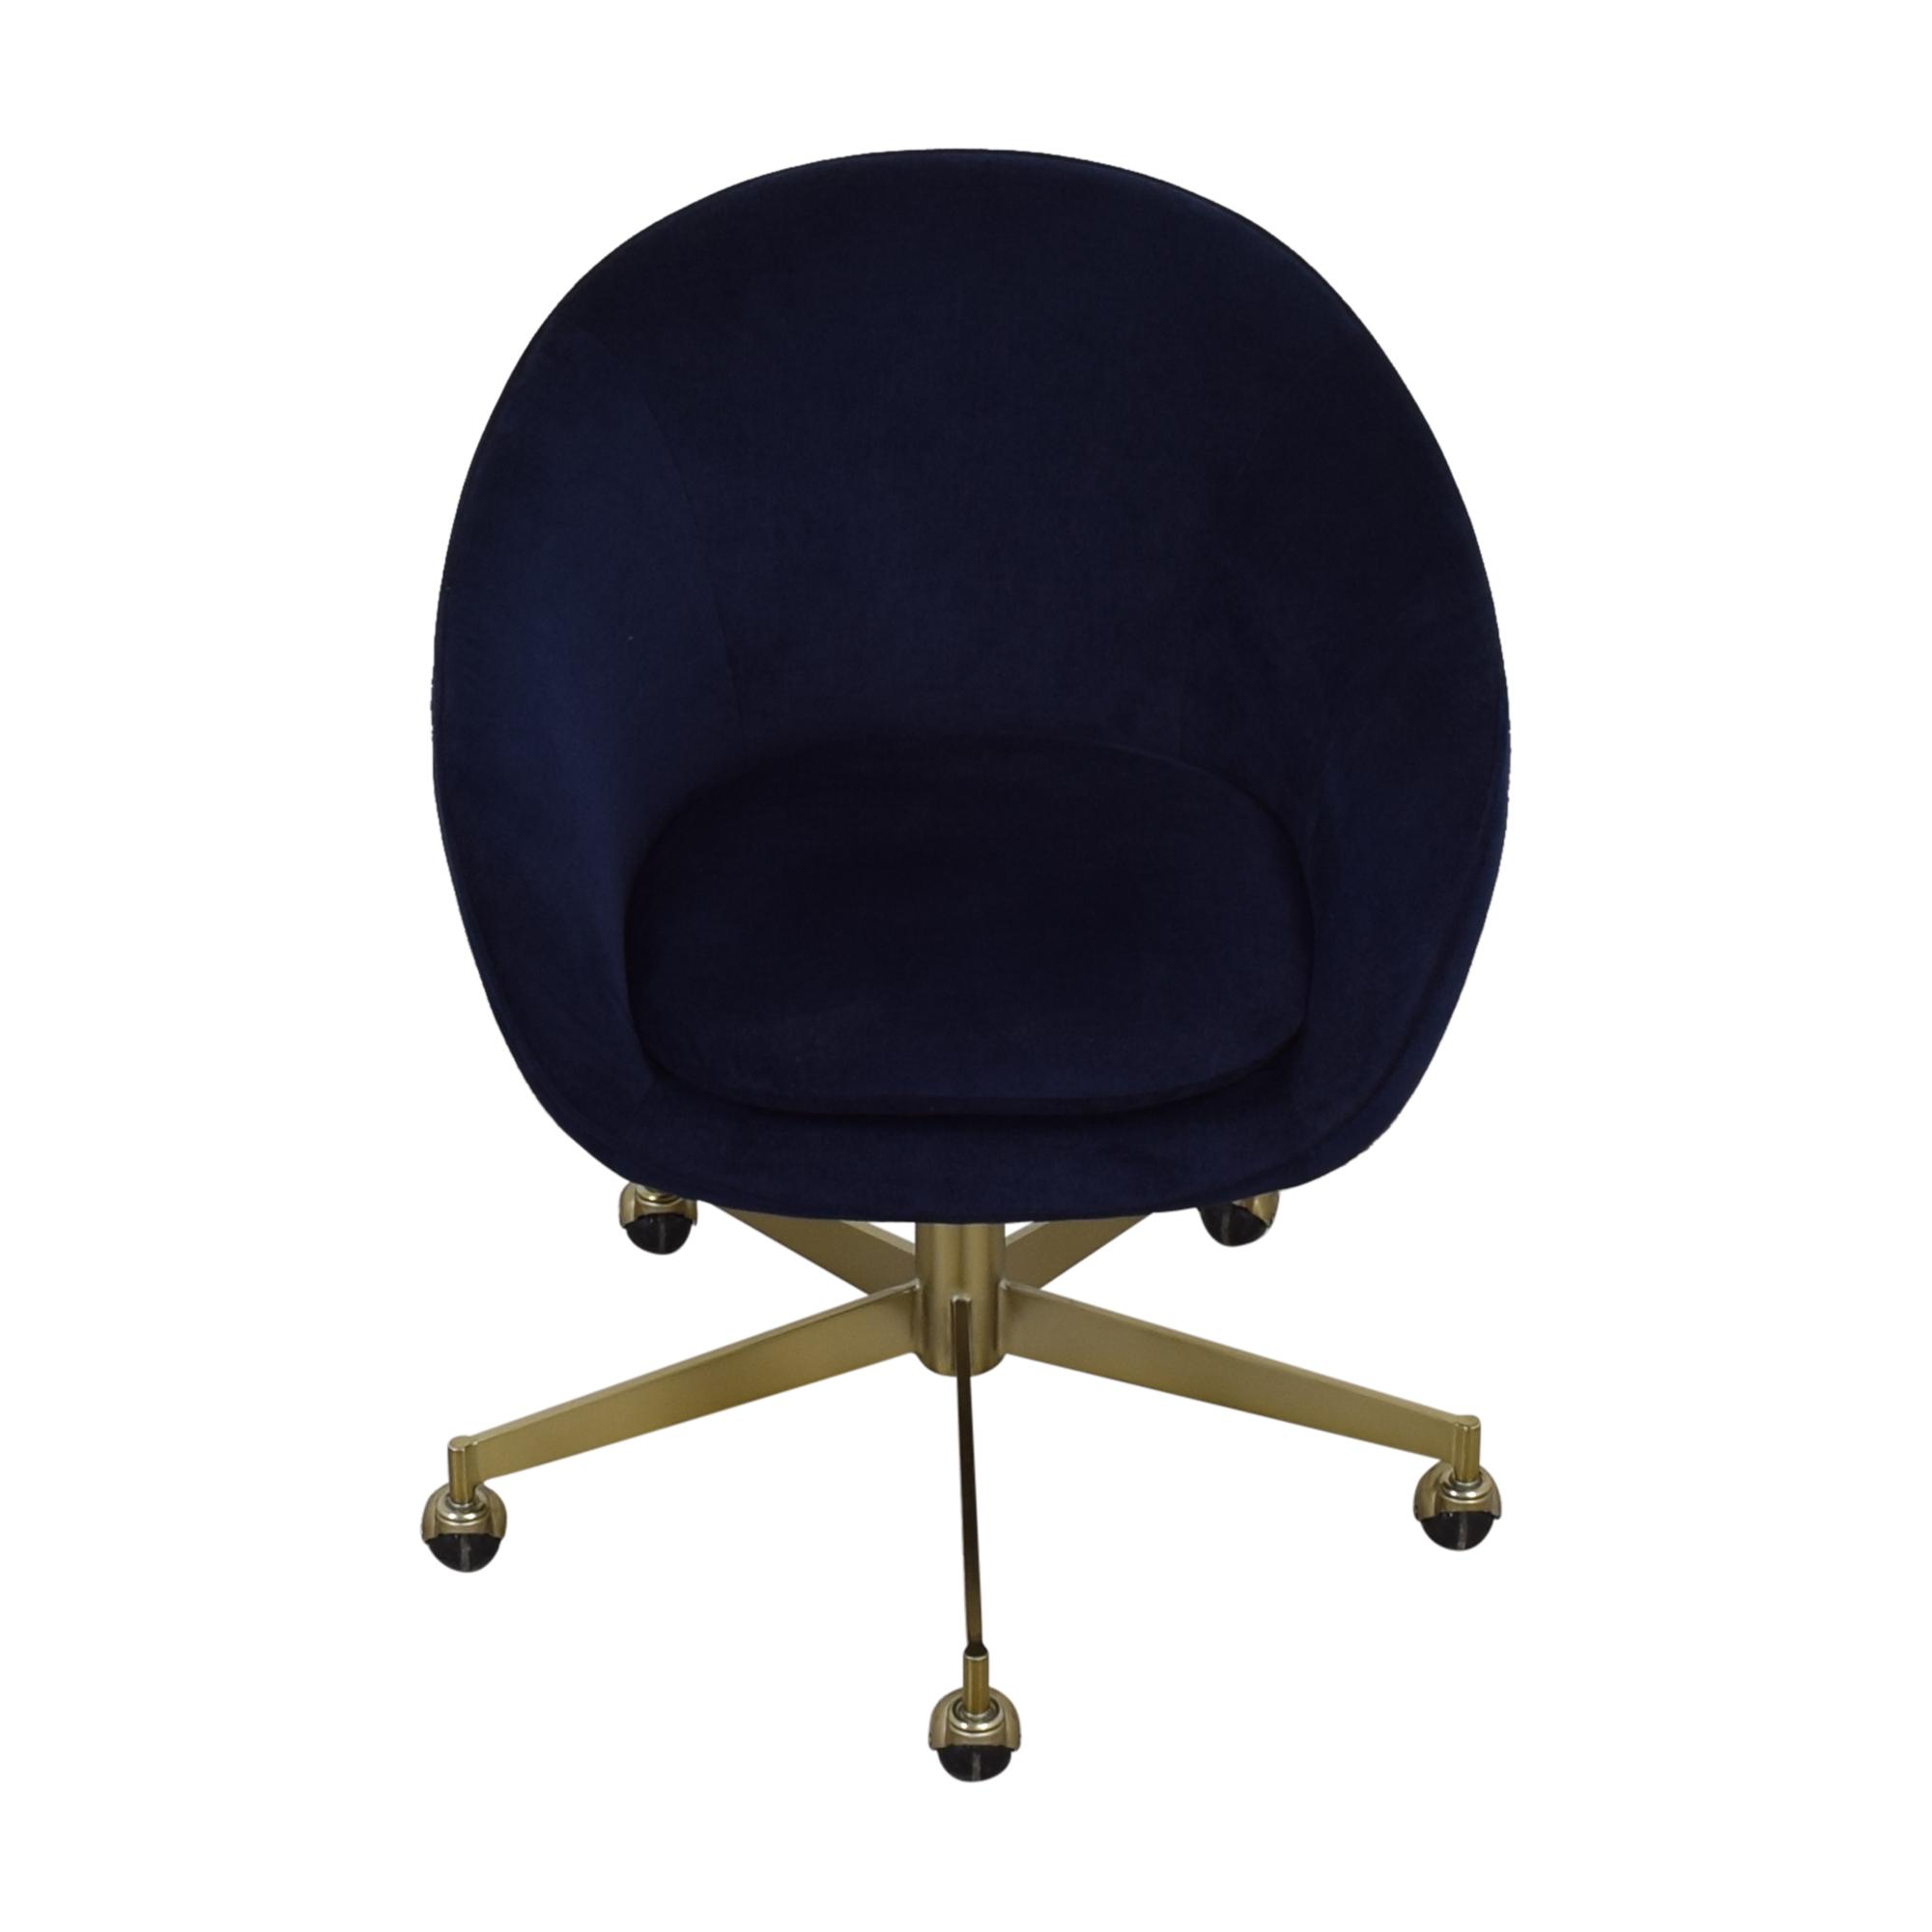 West Elm West Elm Alys Swivel Office Chair used